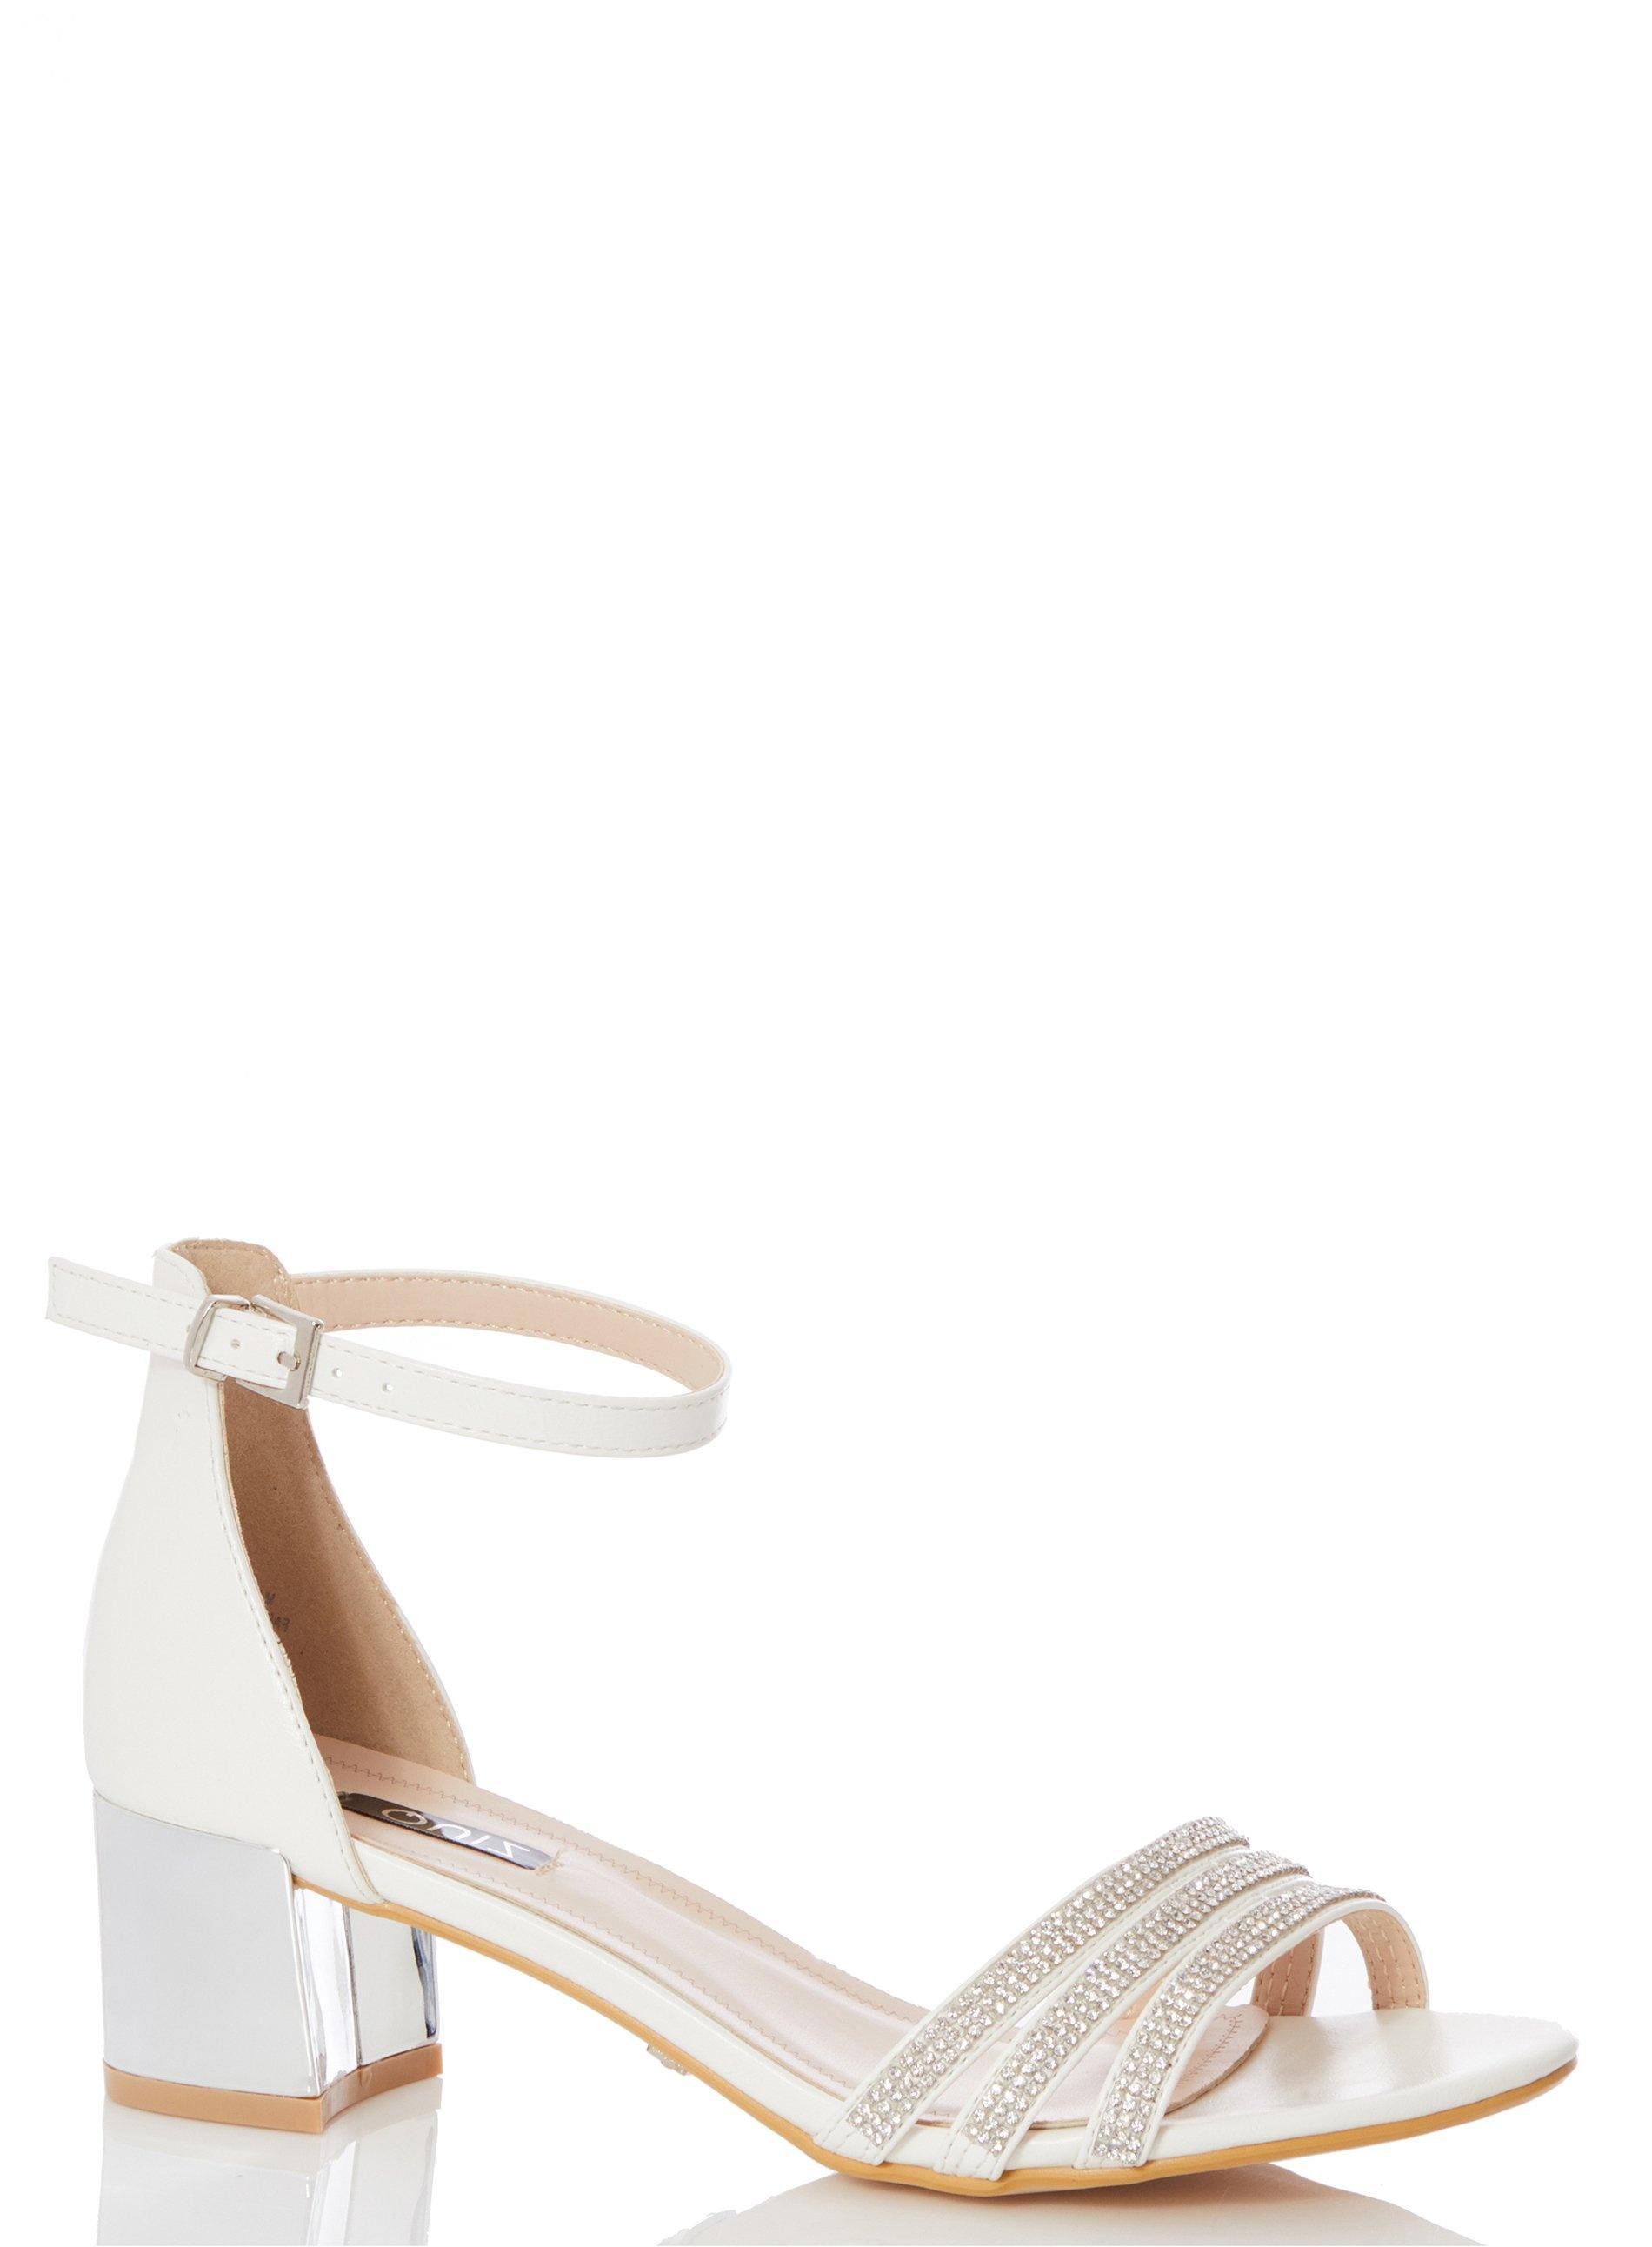 7f44b5c52ed Dorothy Perkins. Women s White Quiz Bridal Diamante Strap Heeled Sandals